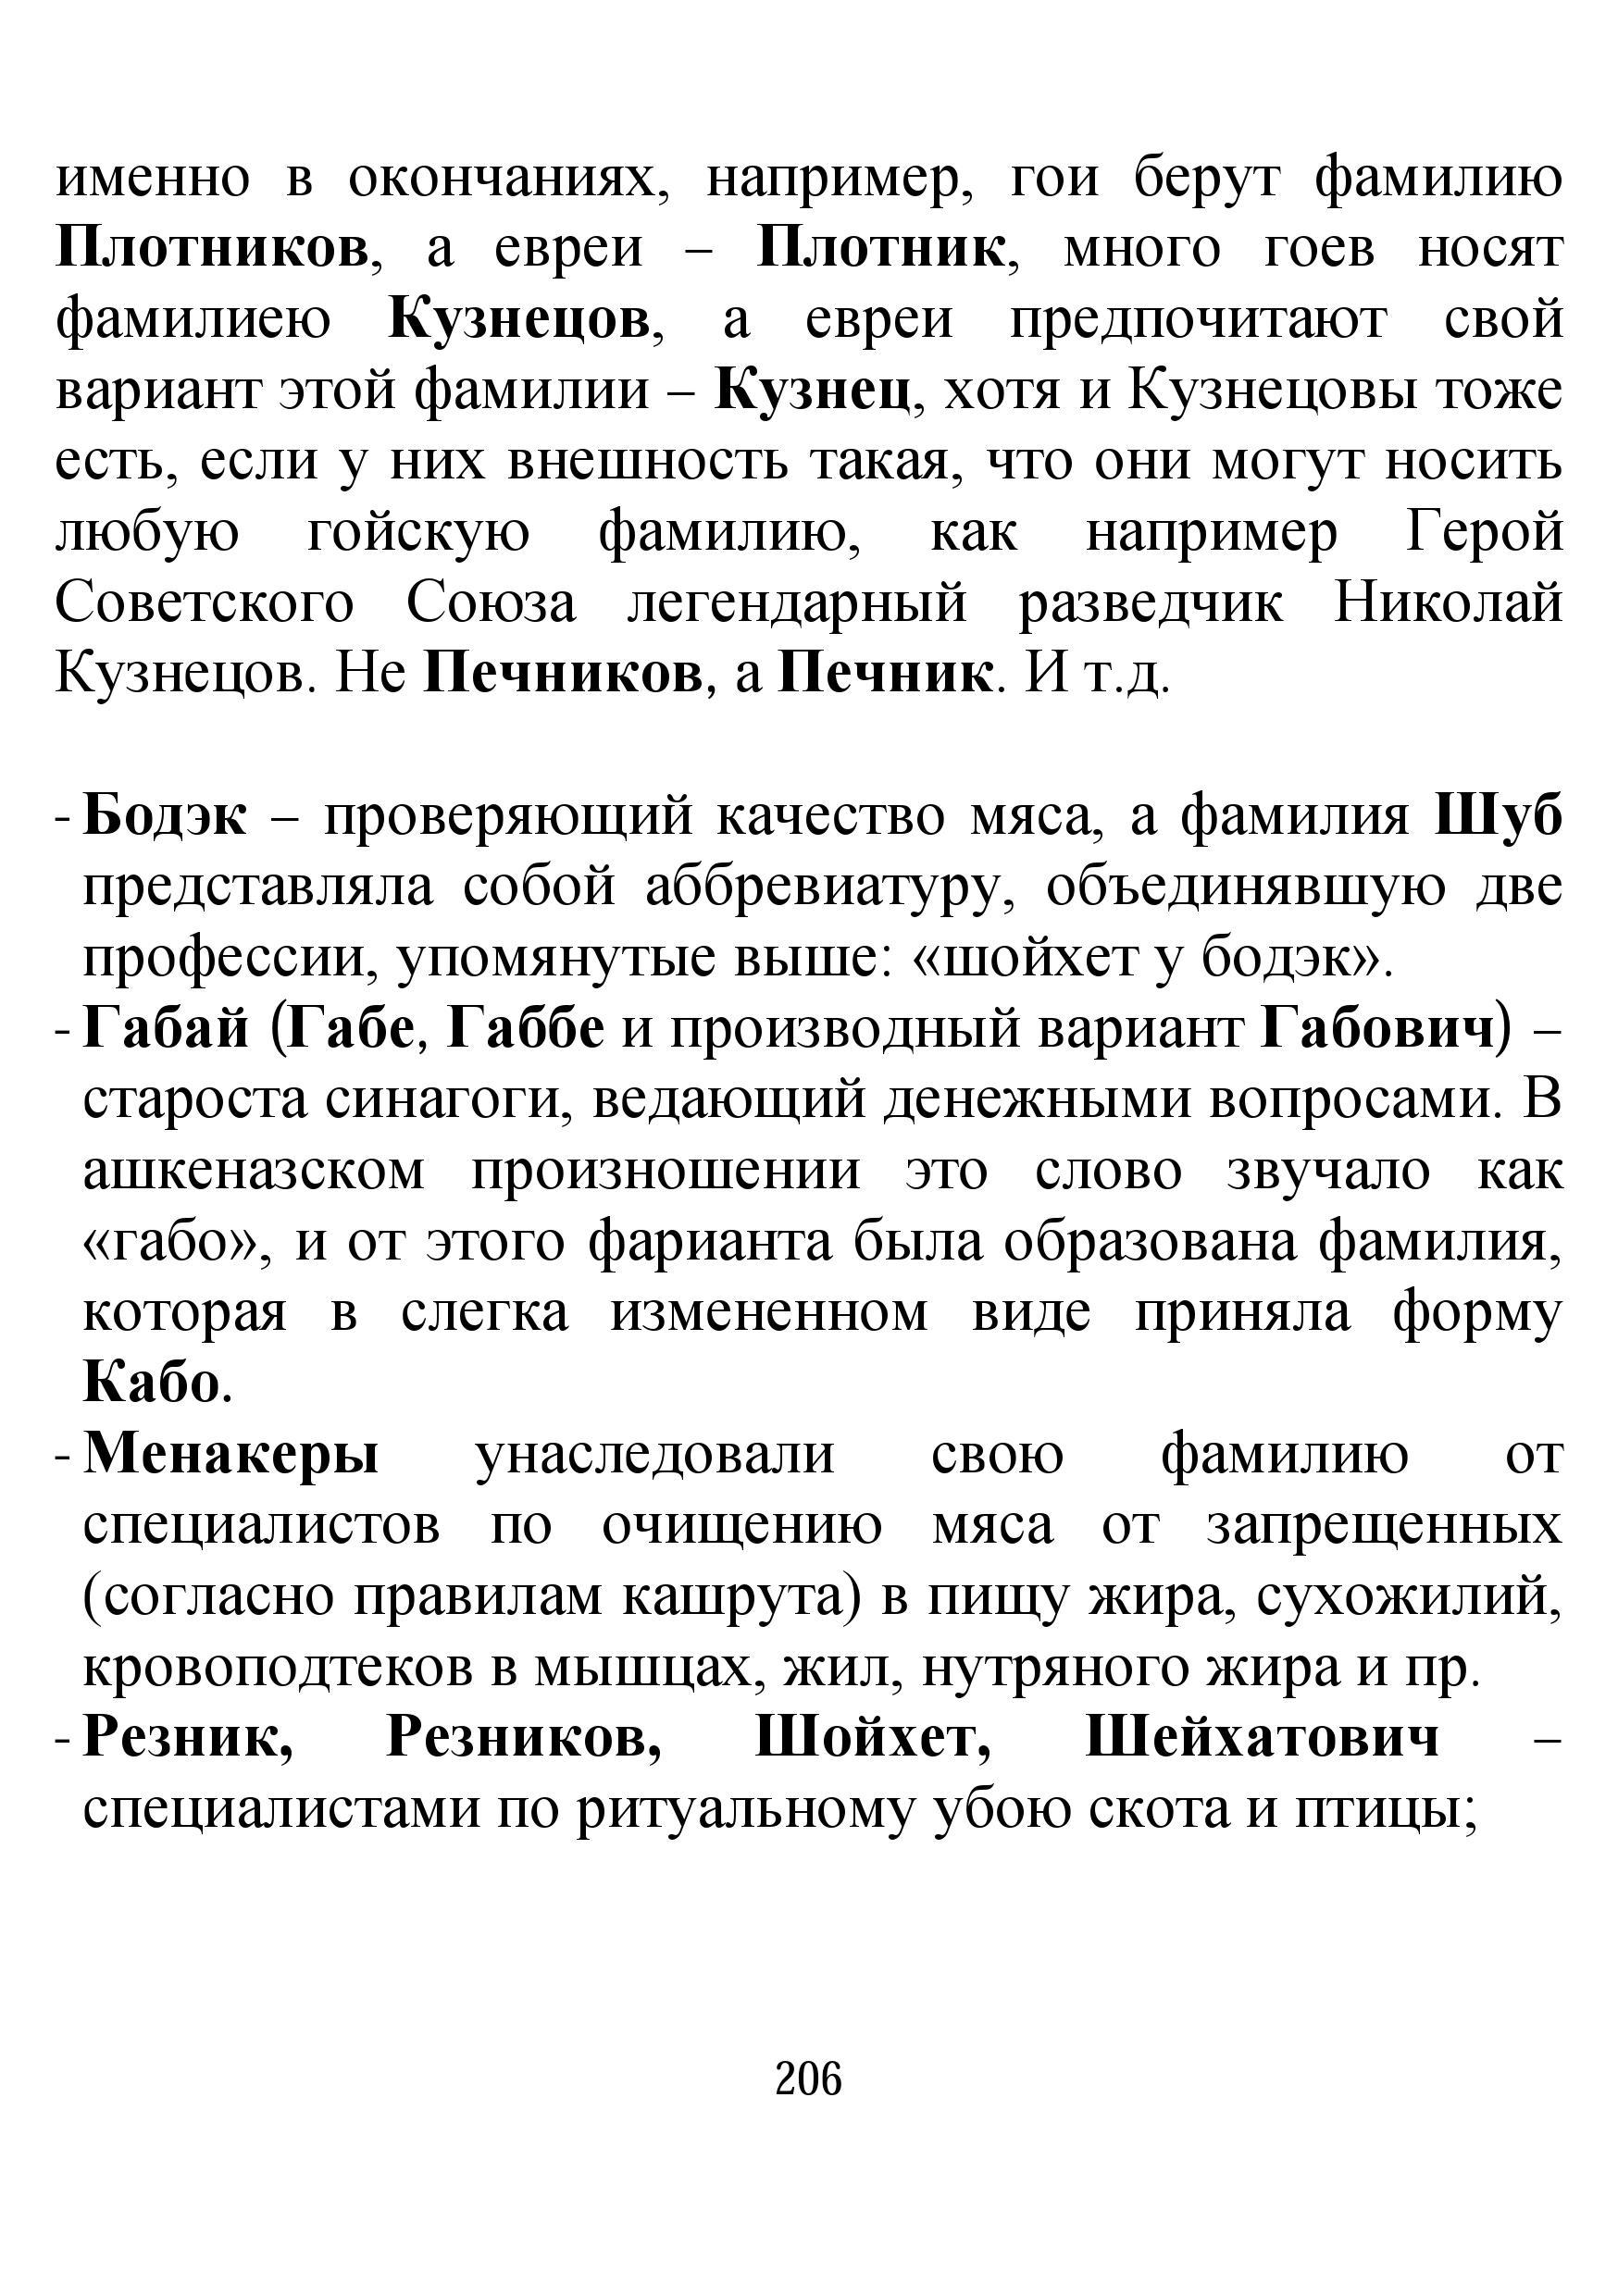 http://s5.uploads.ru/oObn9.jpg